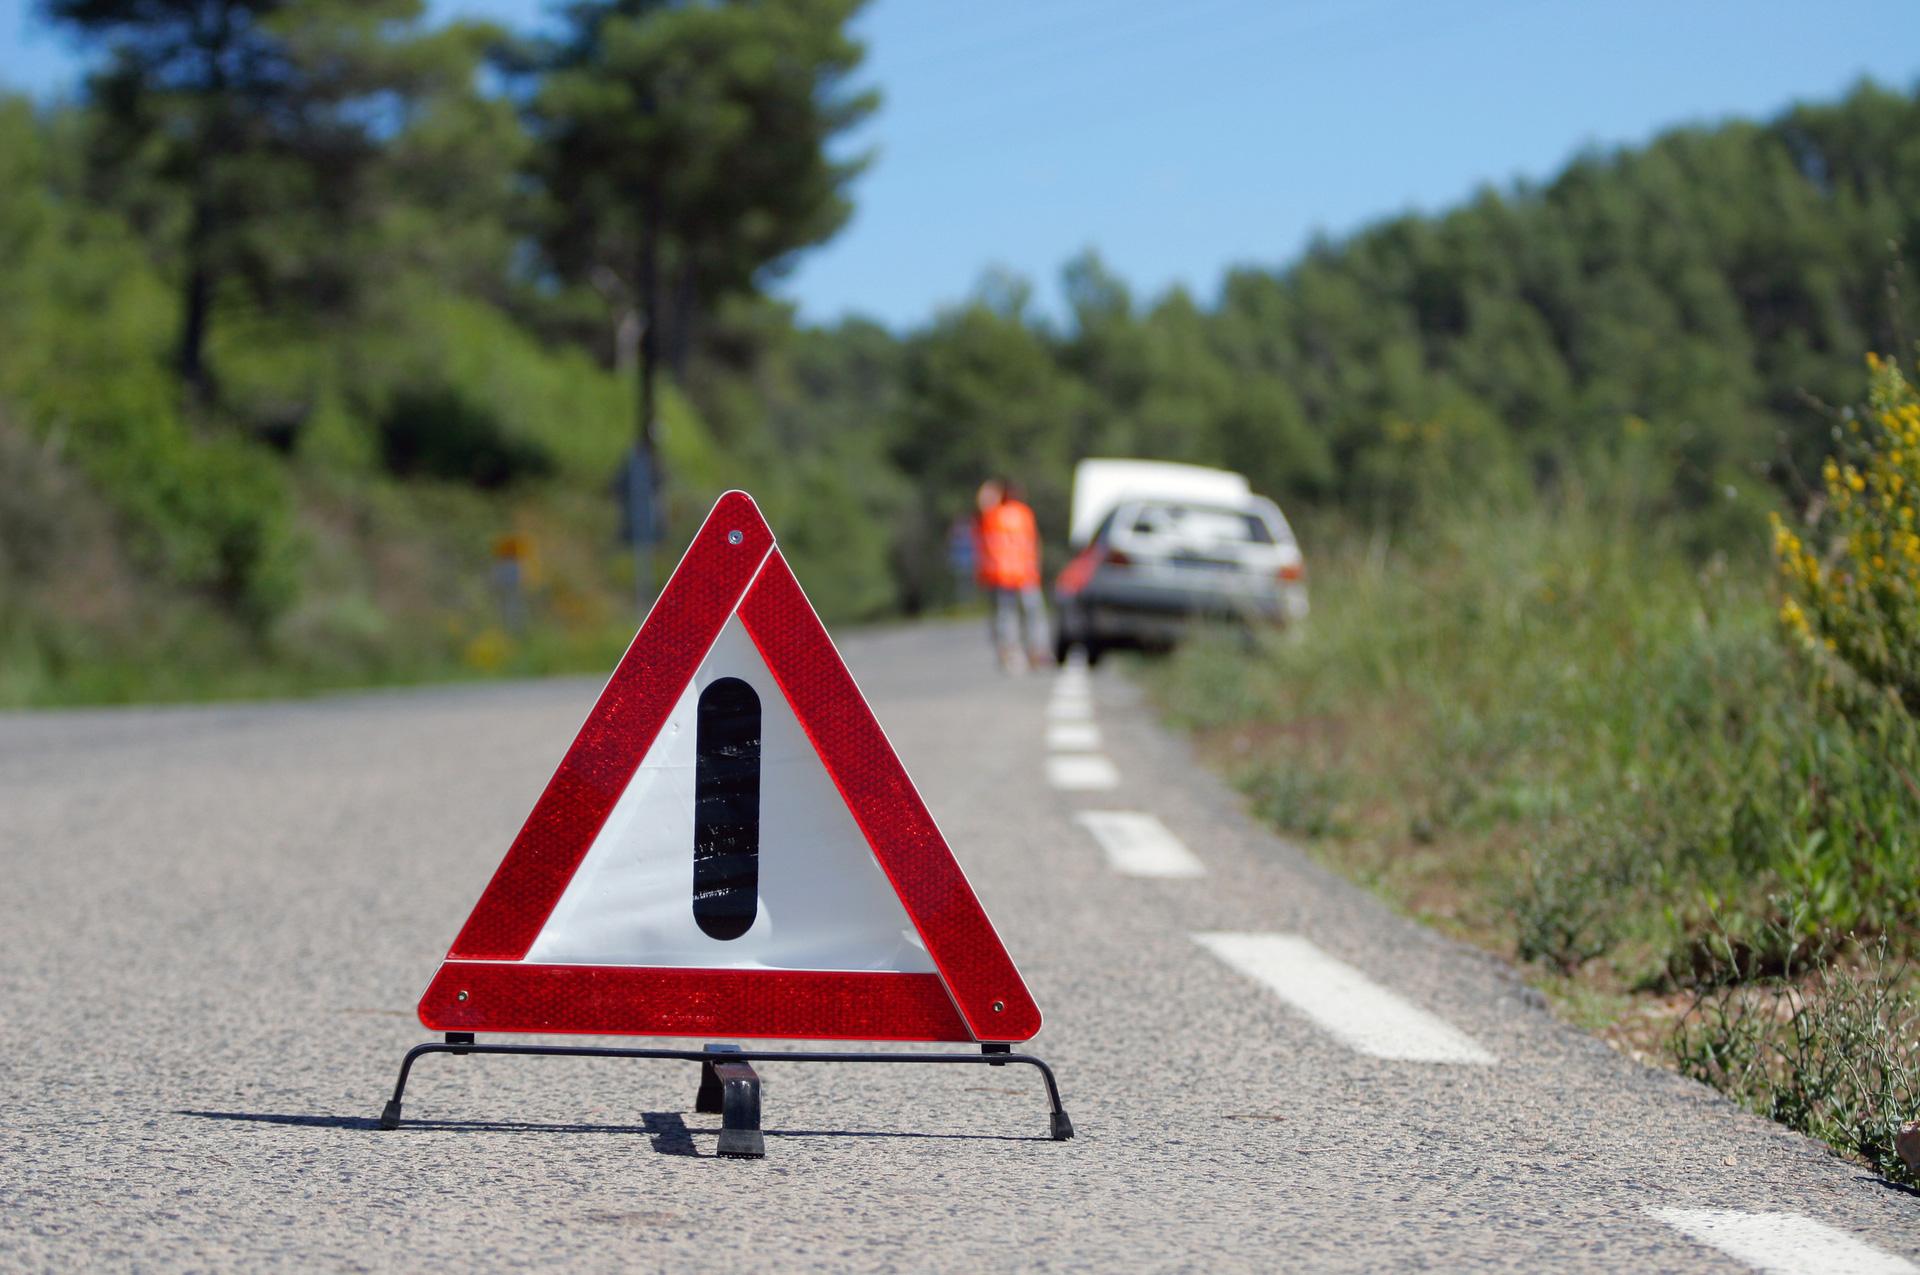 Car breakdown warning sign